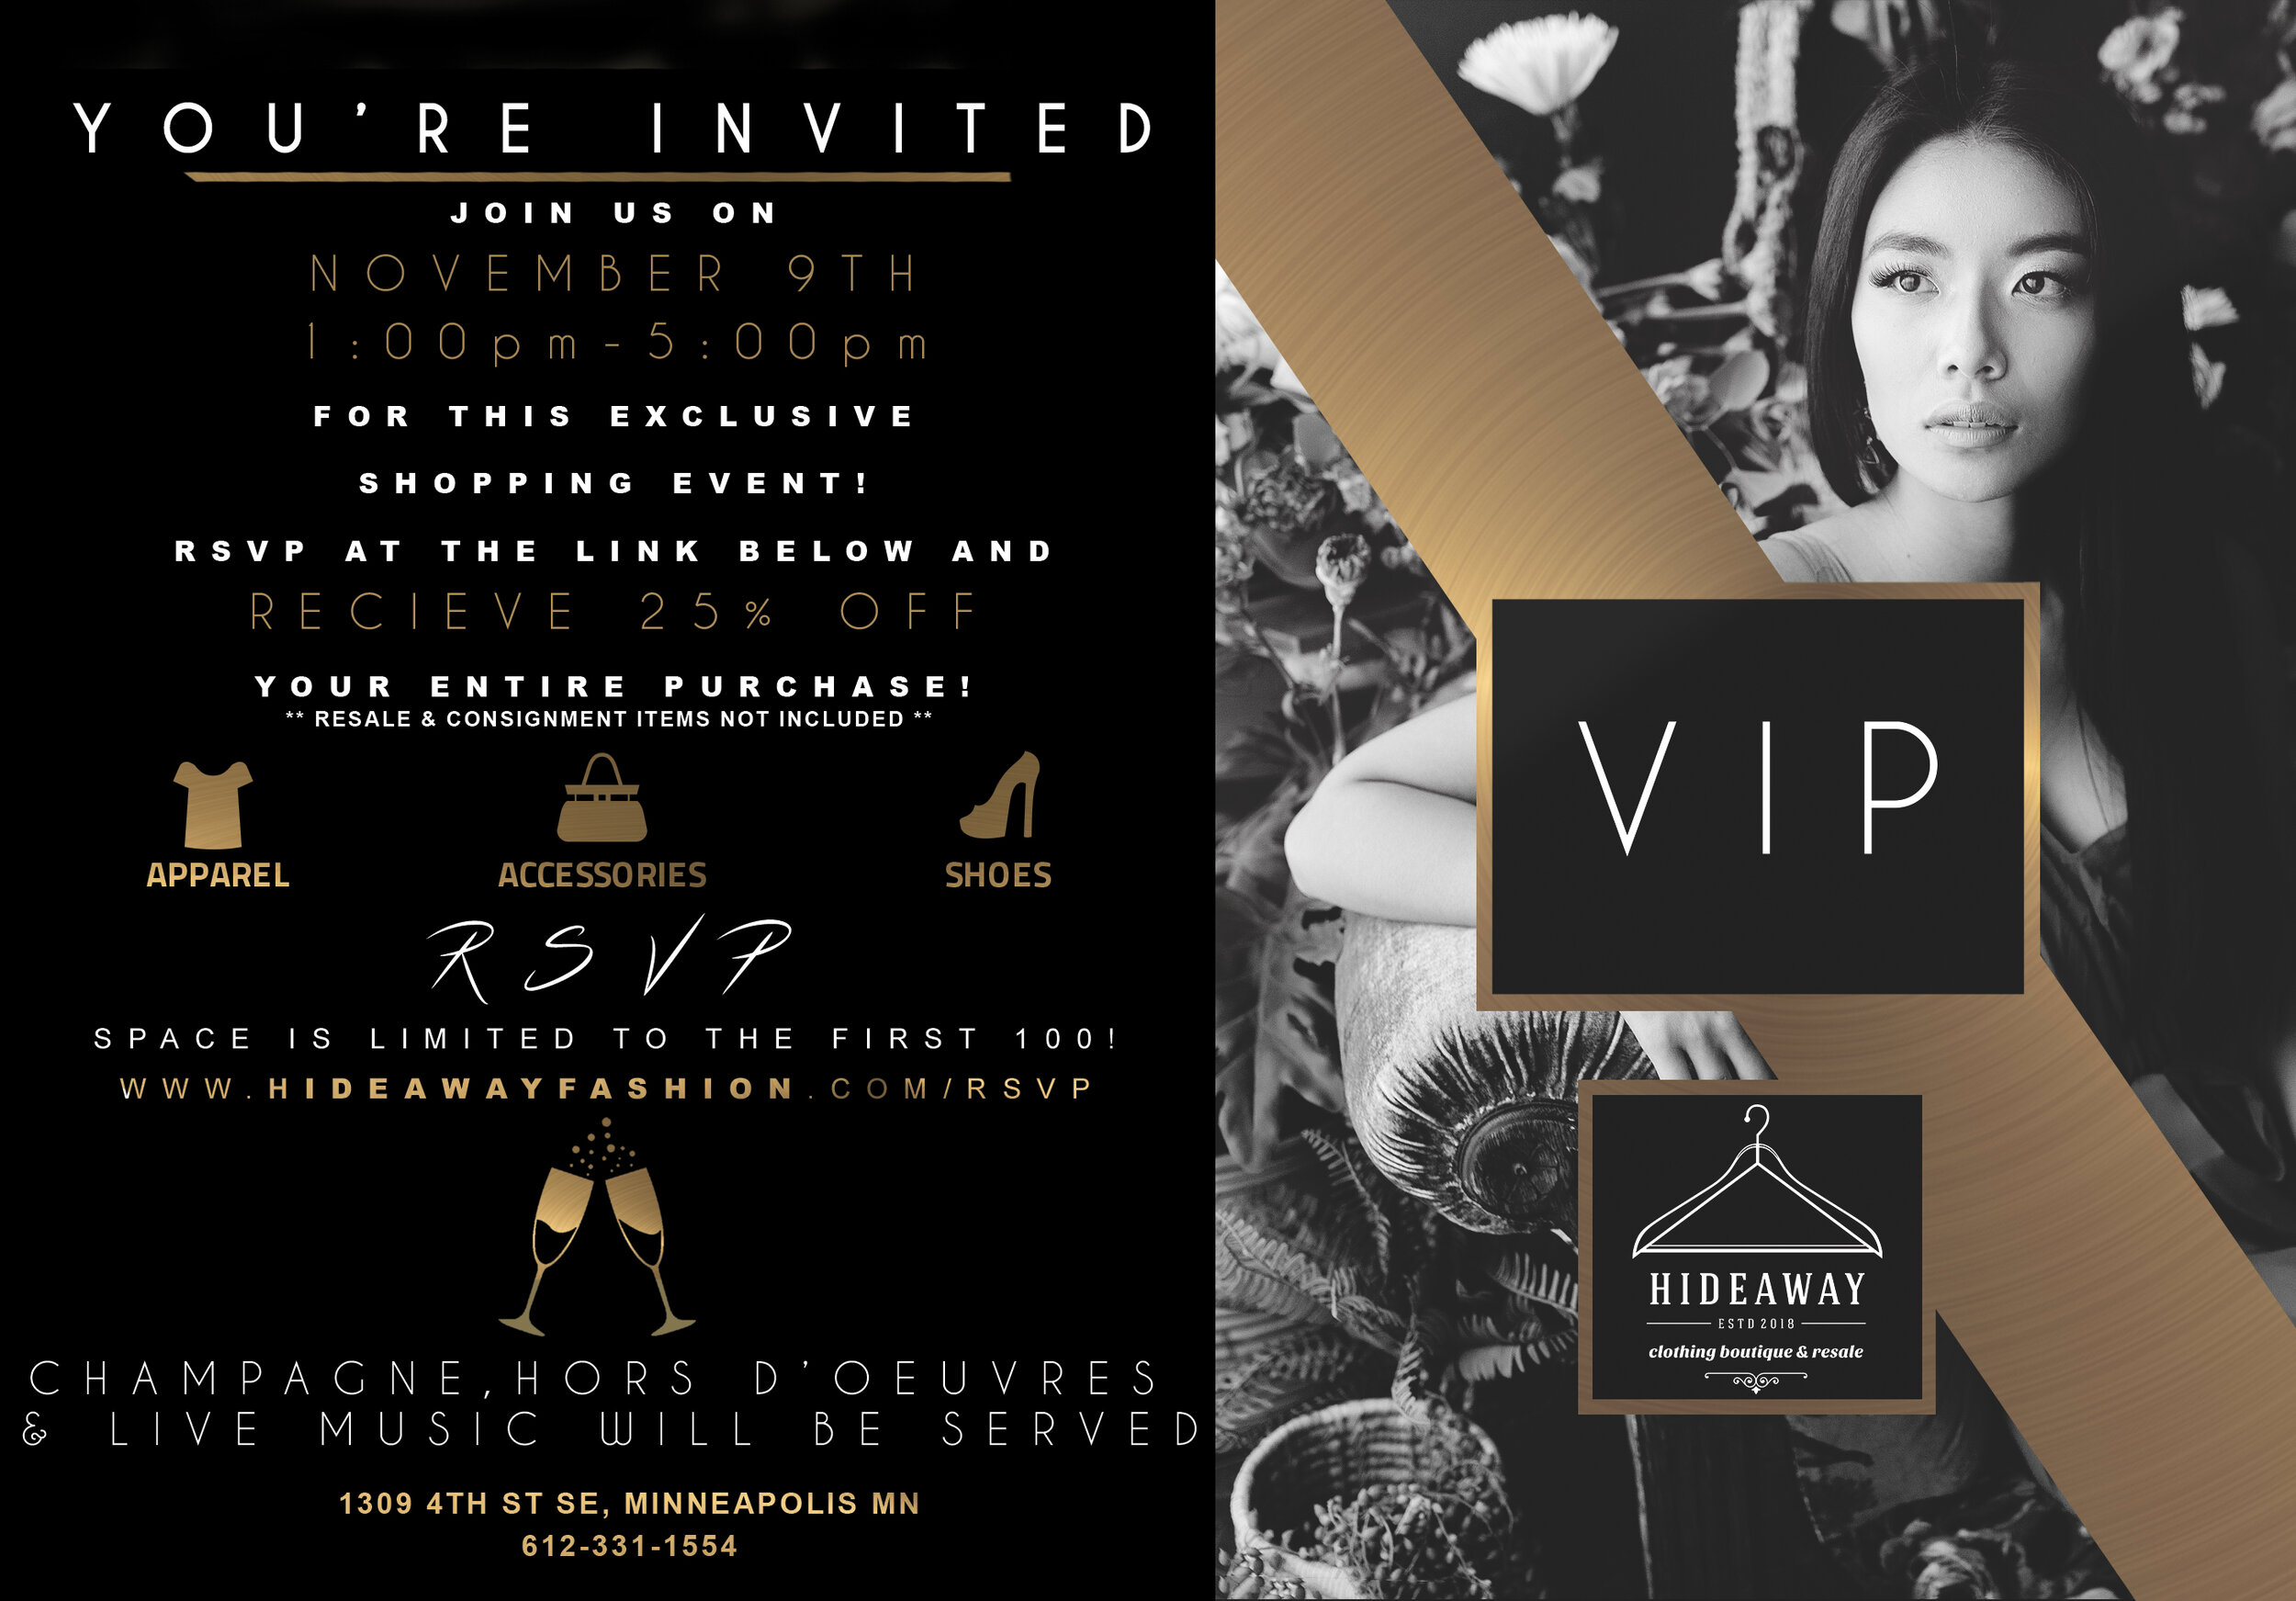 EXLUSIVE-invite Flyer.jpg